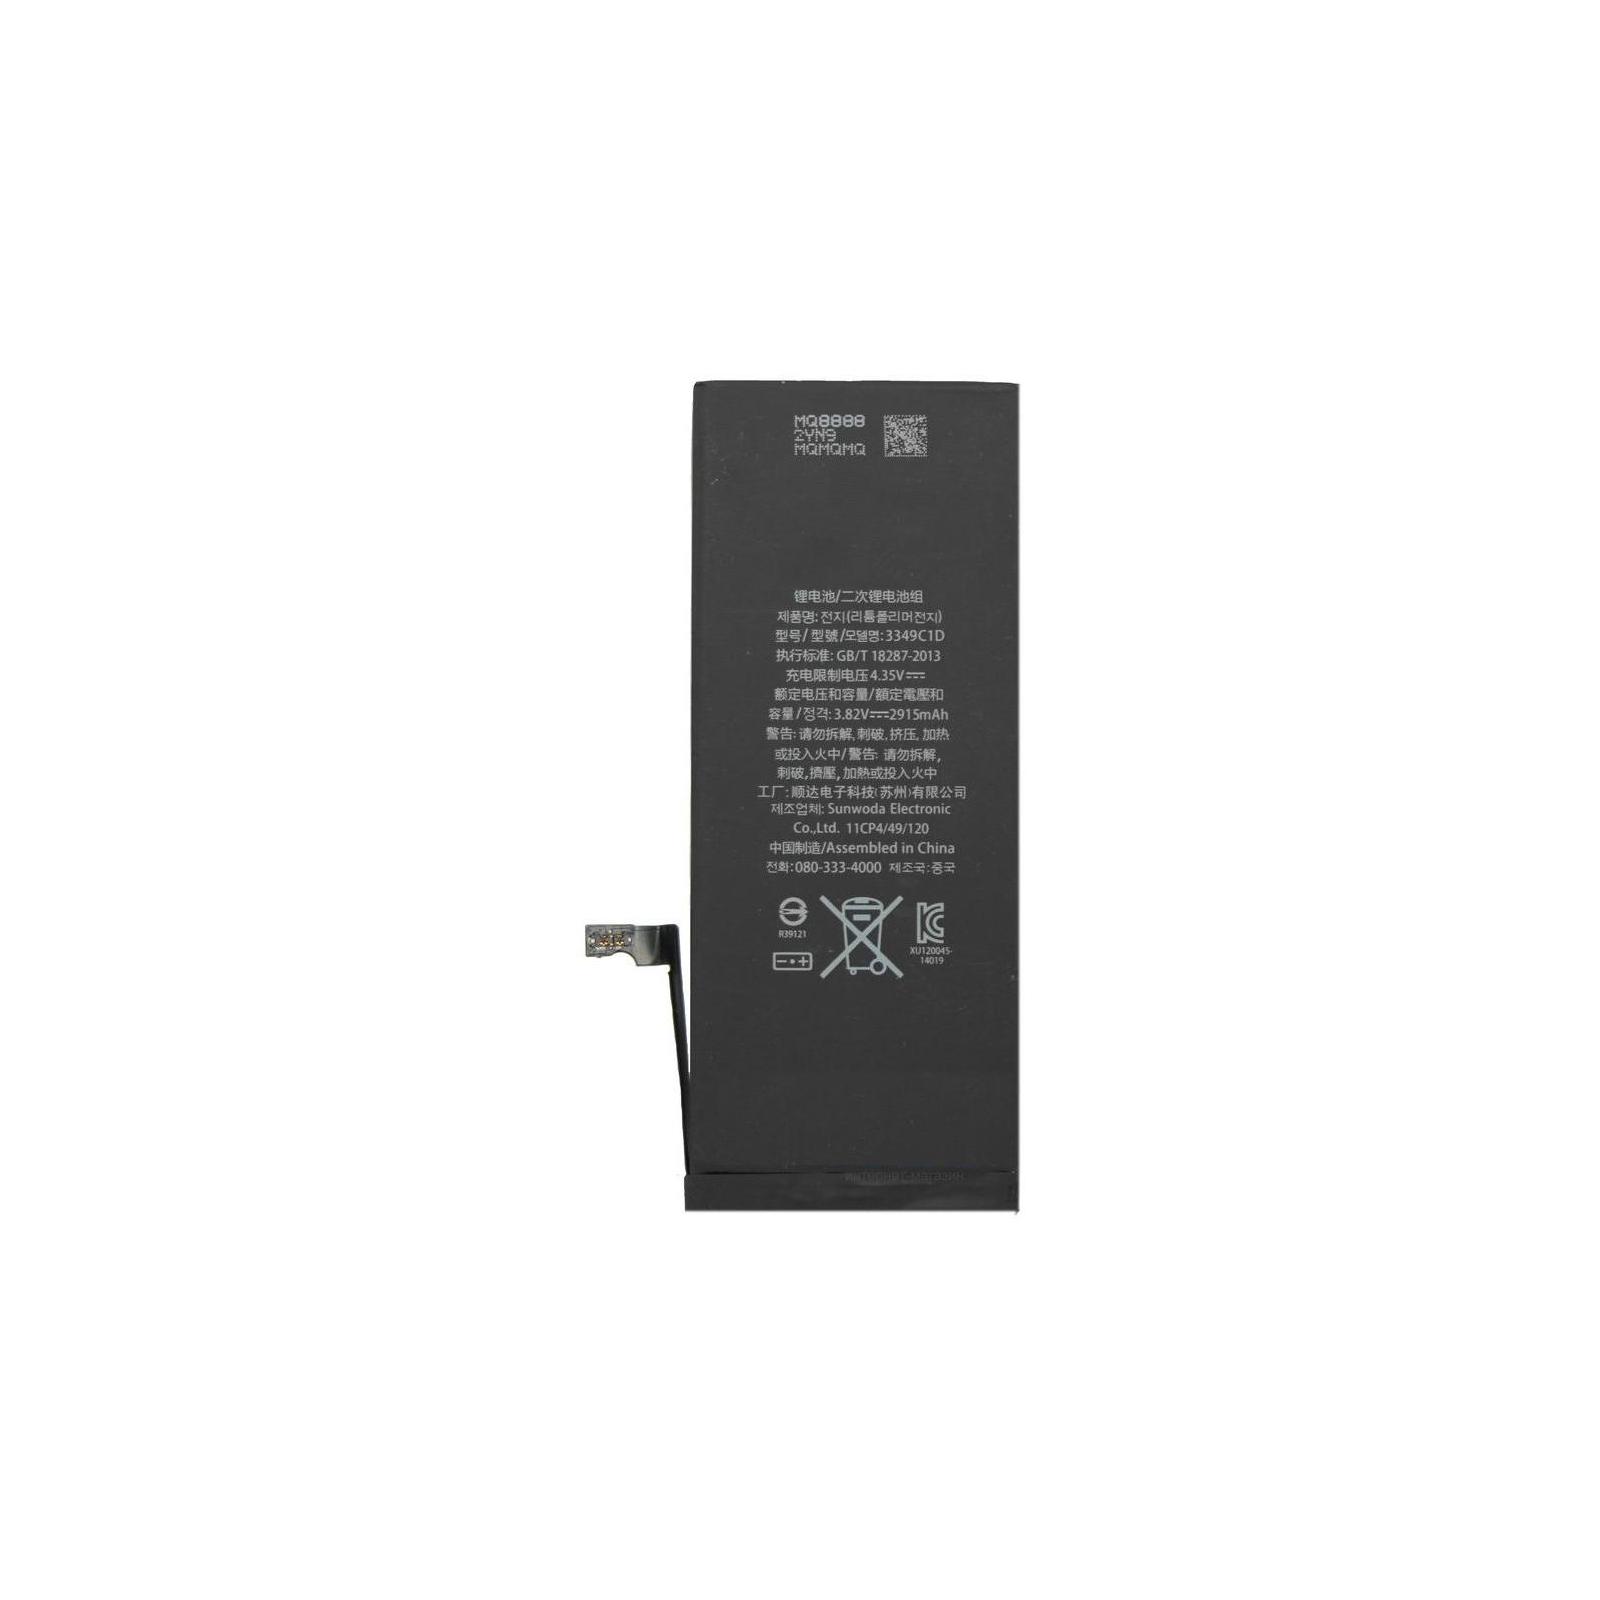 Аккумуляторная батарея Apple for iPhone 6 (1800 mAh) (iPhone 6 / 55133) изображение 2